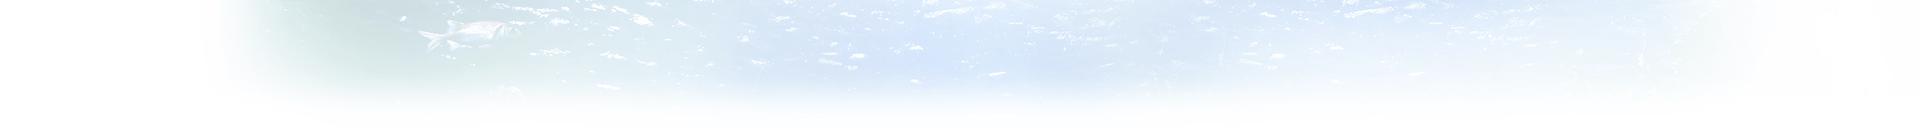 AQua Starロゴ画像背景